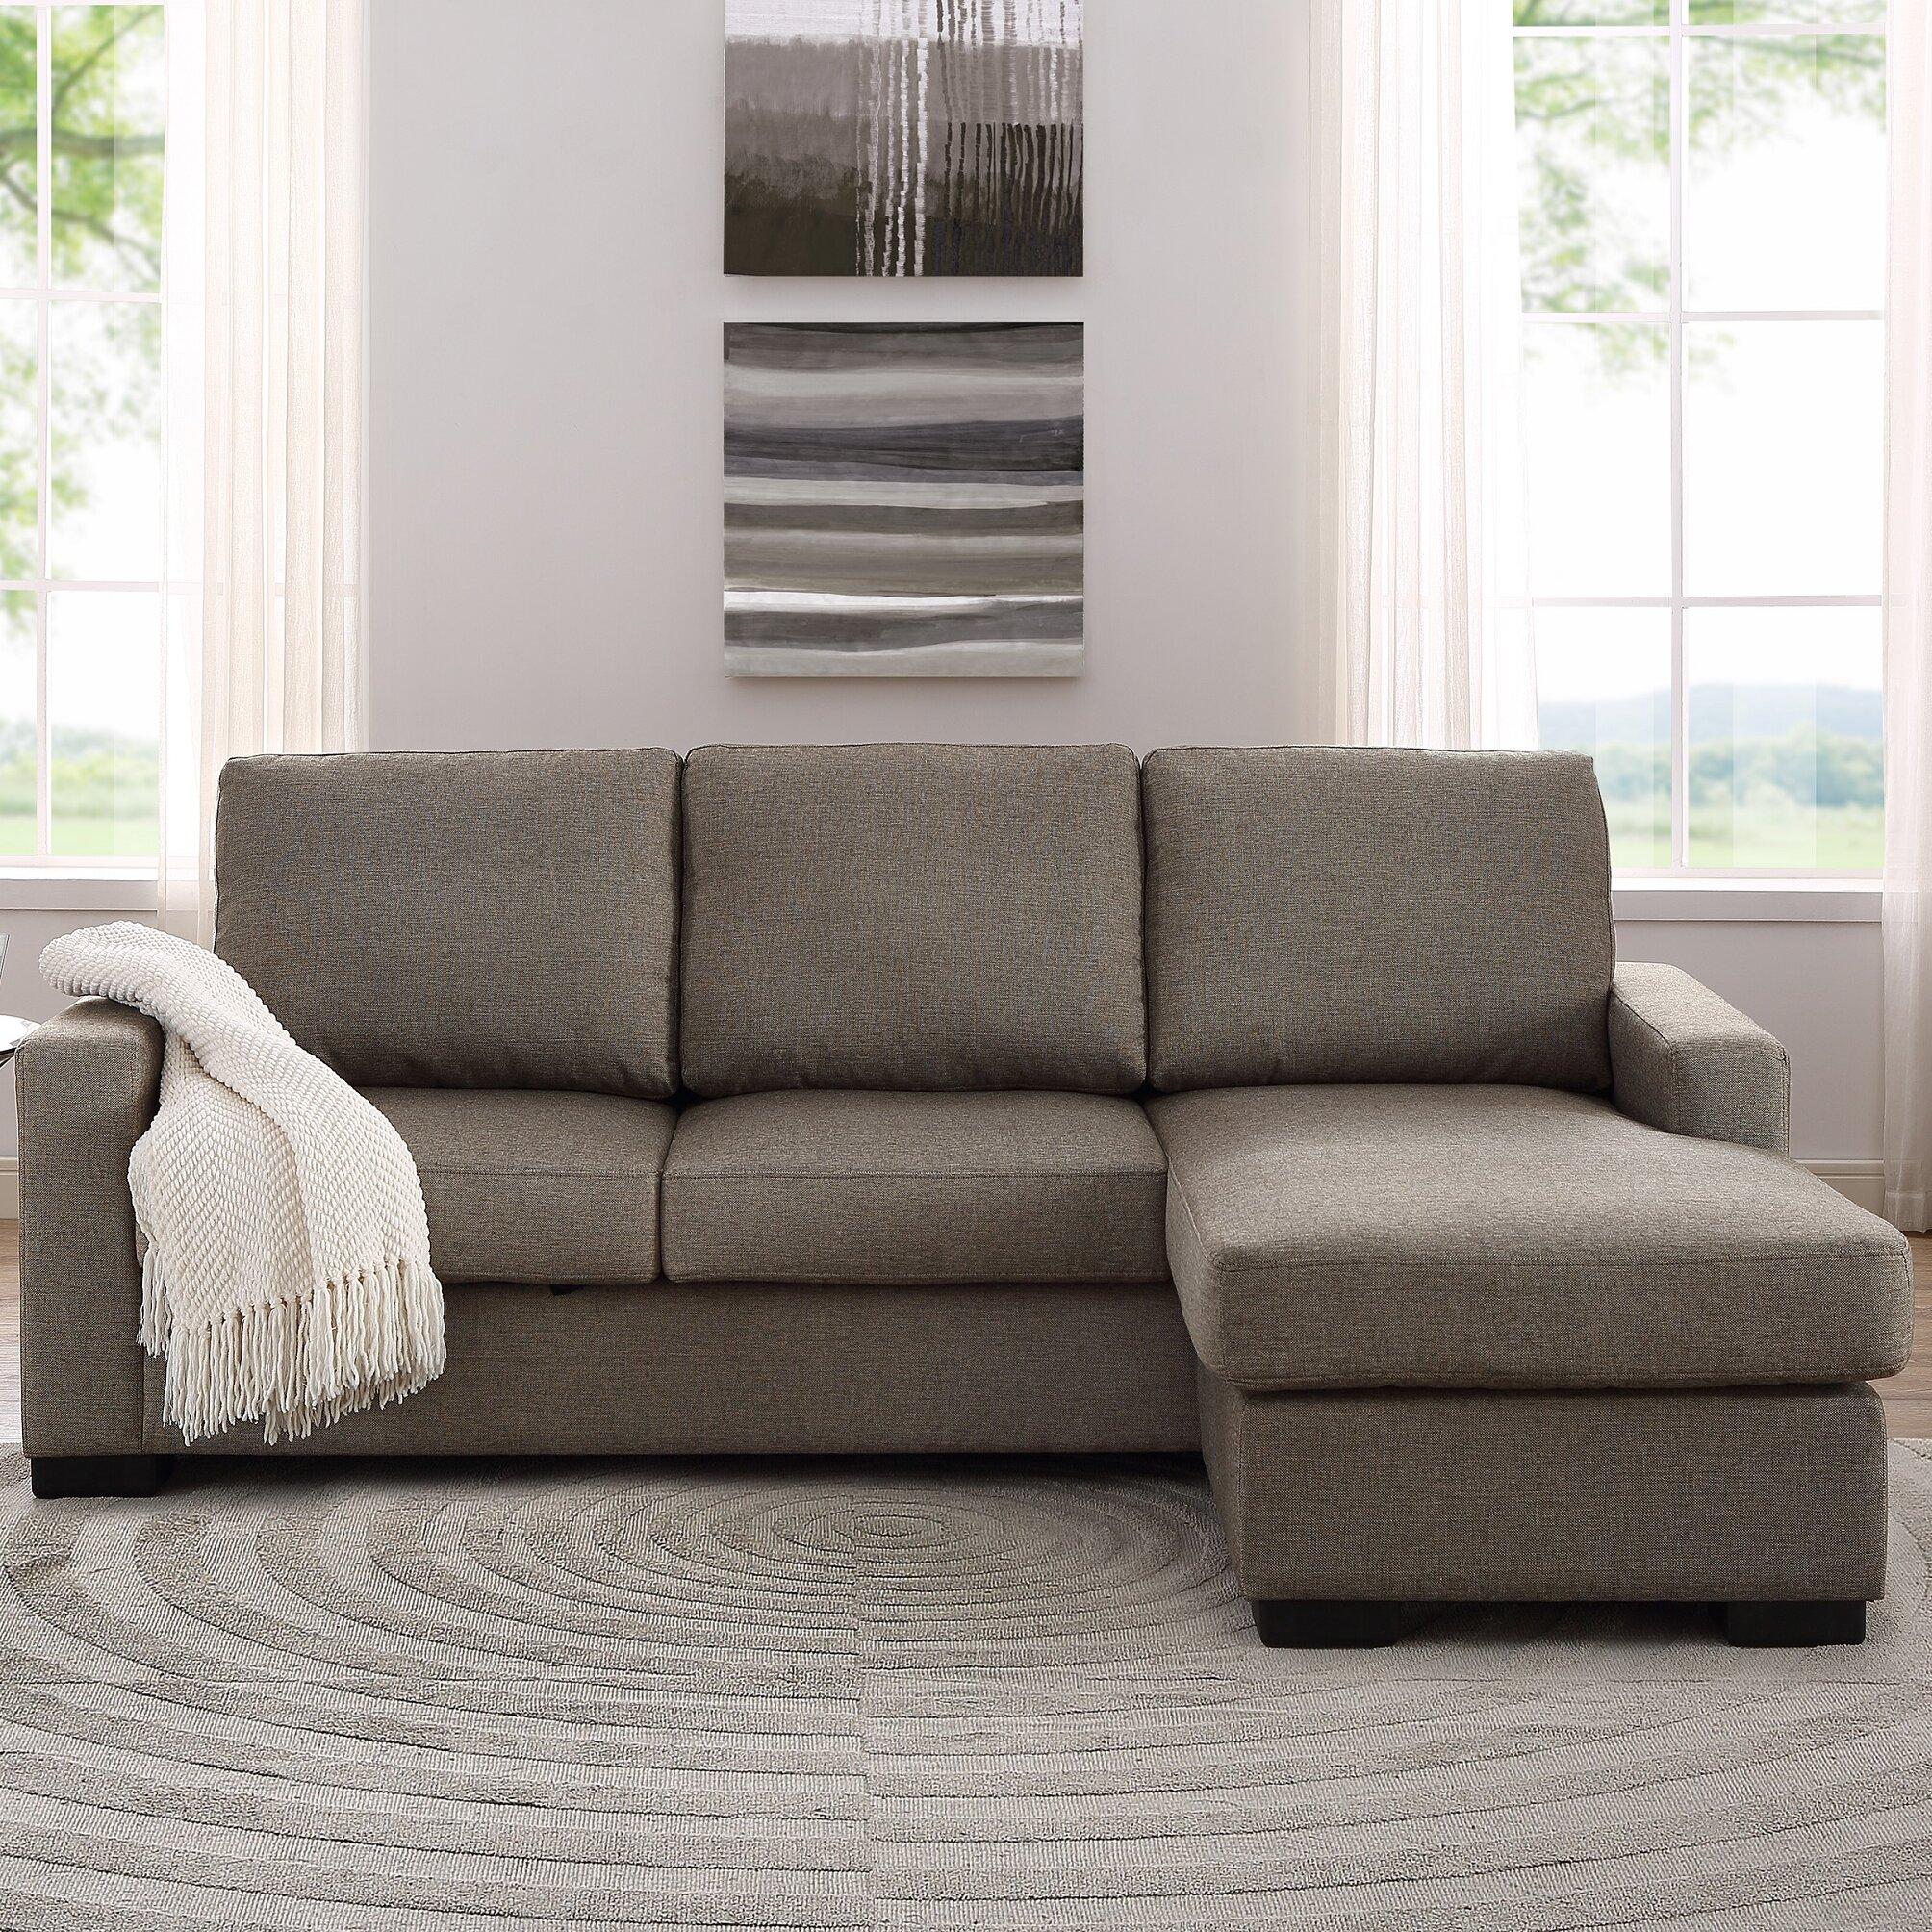 Colton Furniture Reviews